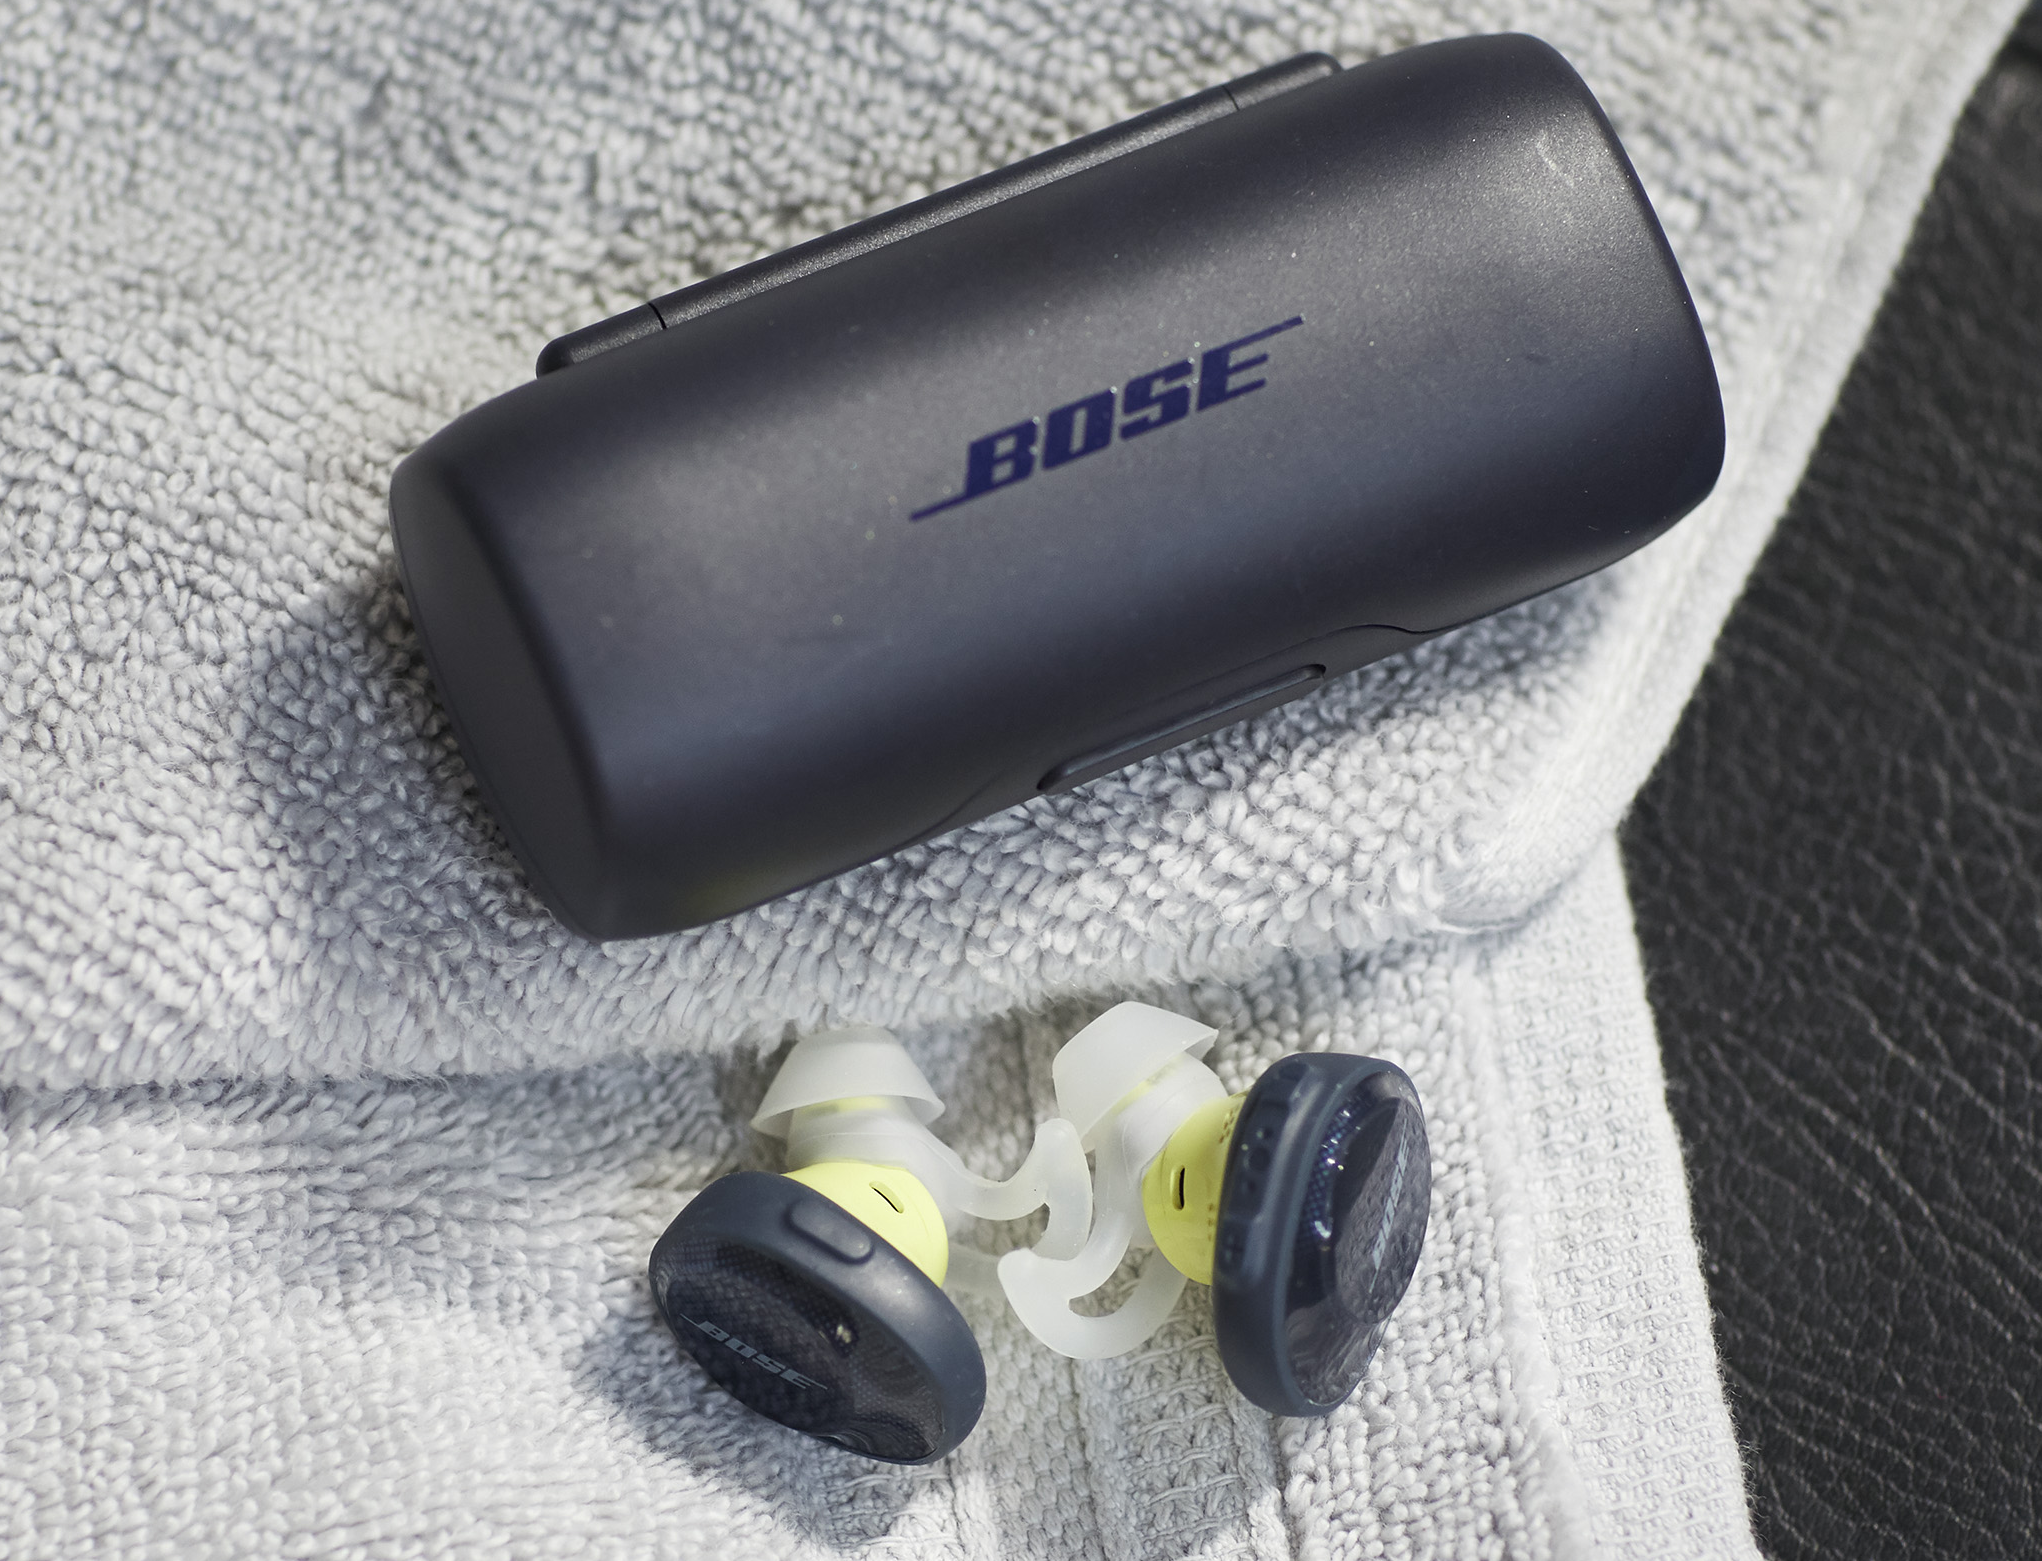 Sound Sport Free: Bose bringt kabellose Bluetooth-Hörstöpsel - Sound Sport Free mit Ladeetui (Bild: Bose)